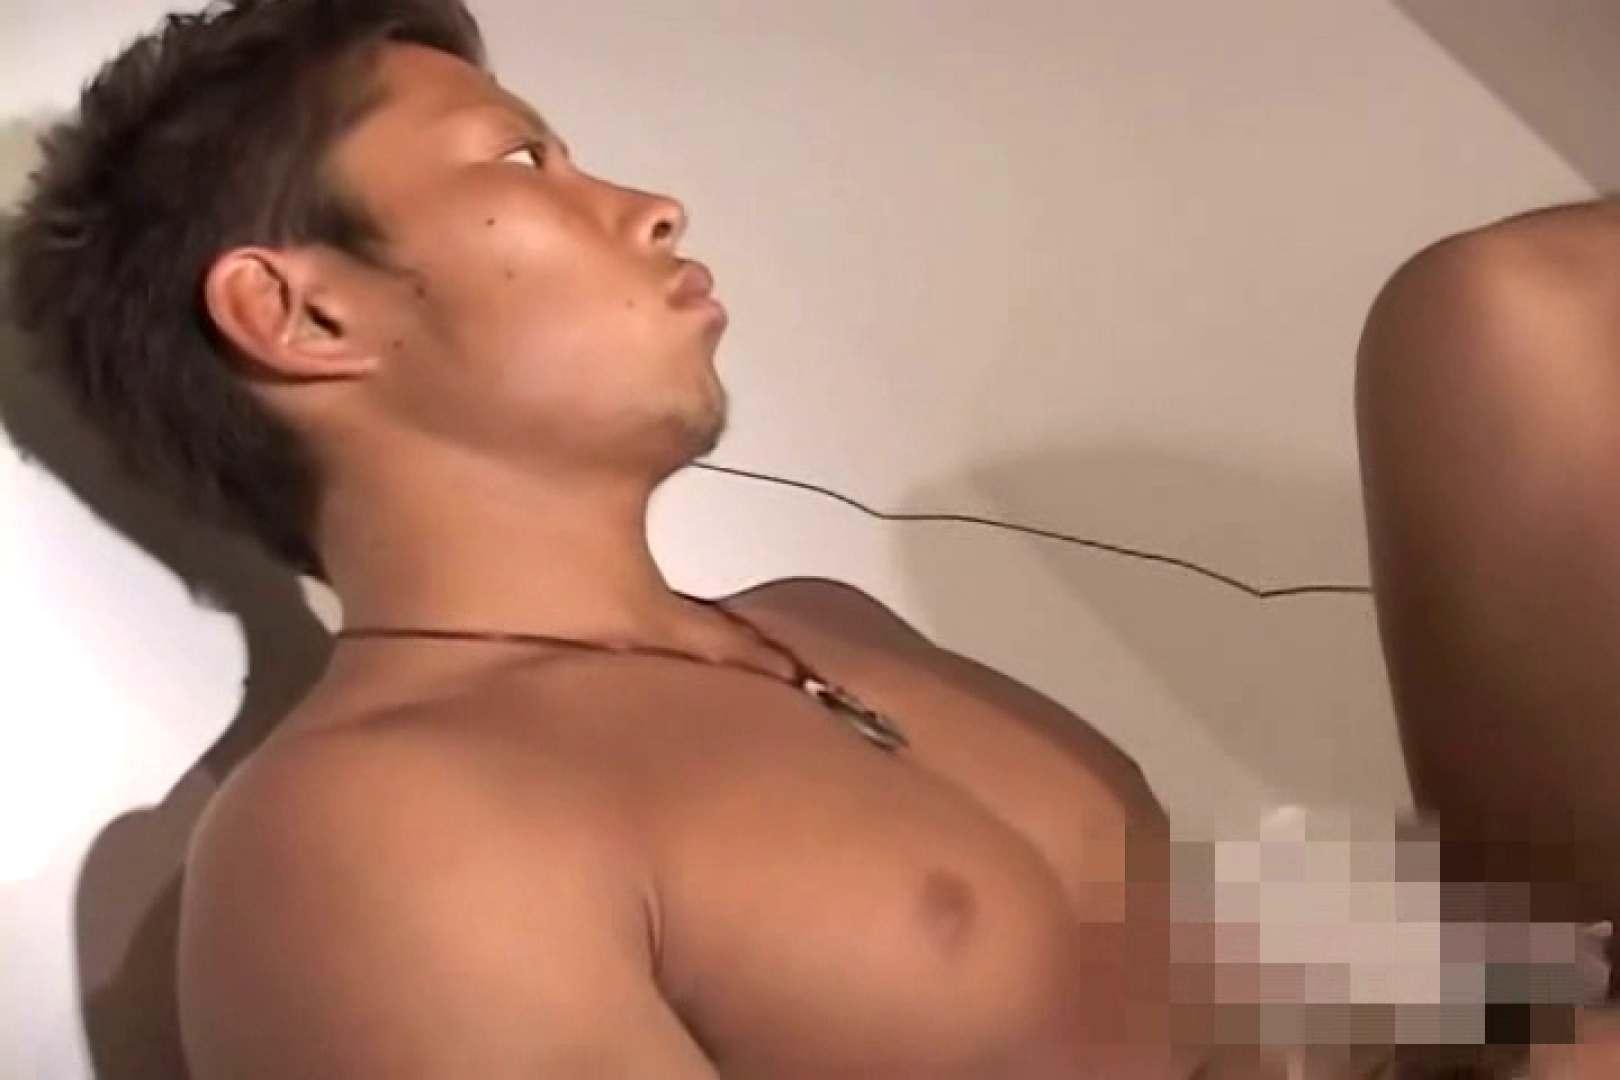 Beautiful muscle モッコリ野郎達!Vol.02 イケメンのsex | スリム美少年系ジャニ系  80pic 9